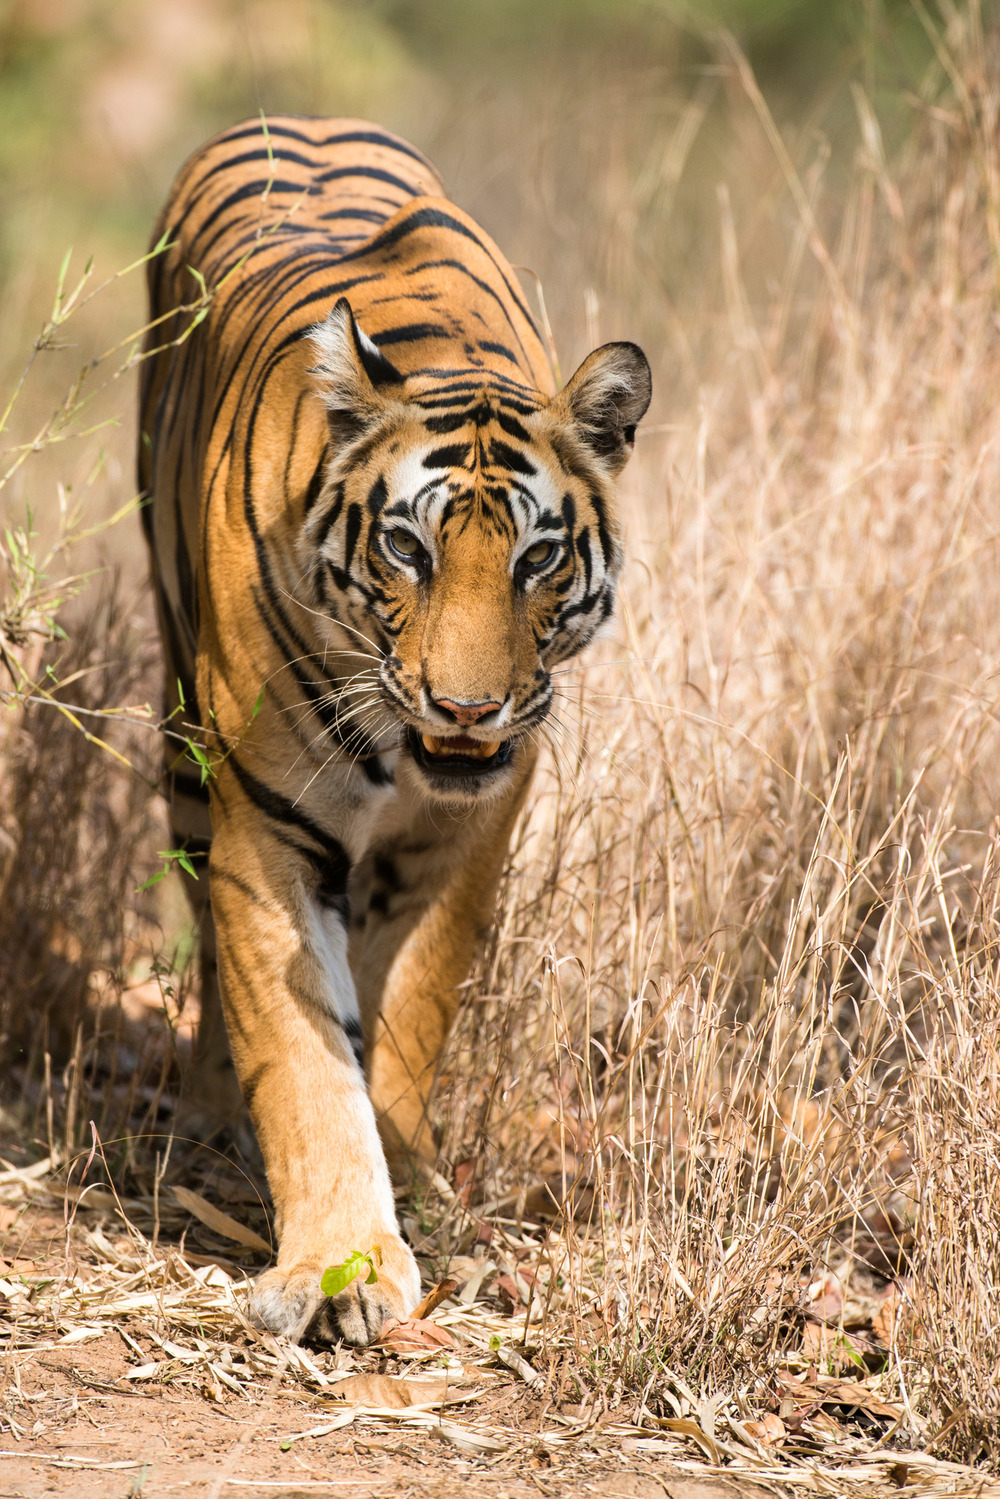 Bengal tigress approaching, Bandhavgarh National Park, Madhya Pradesh, India